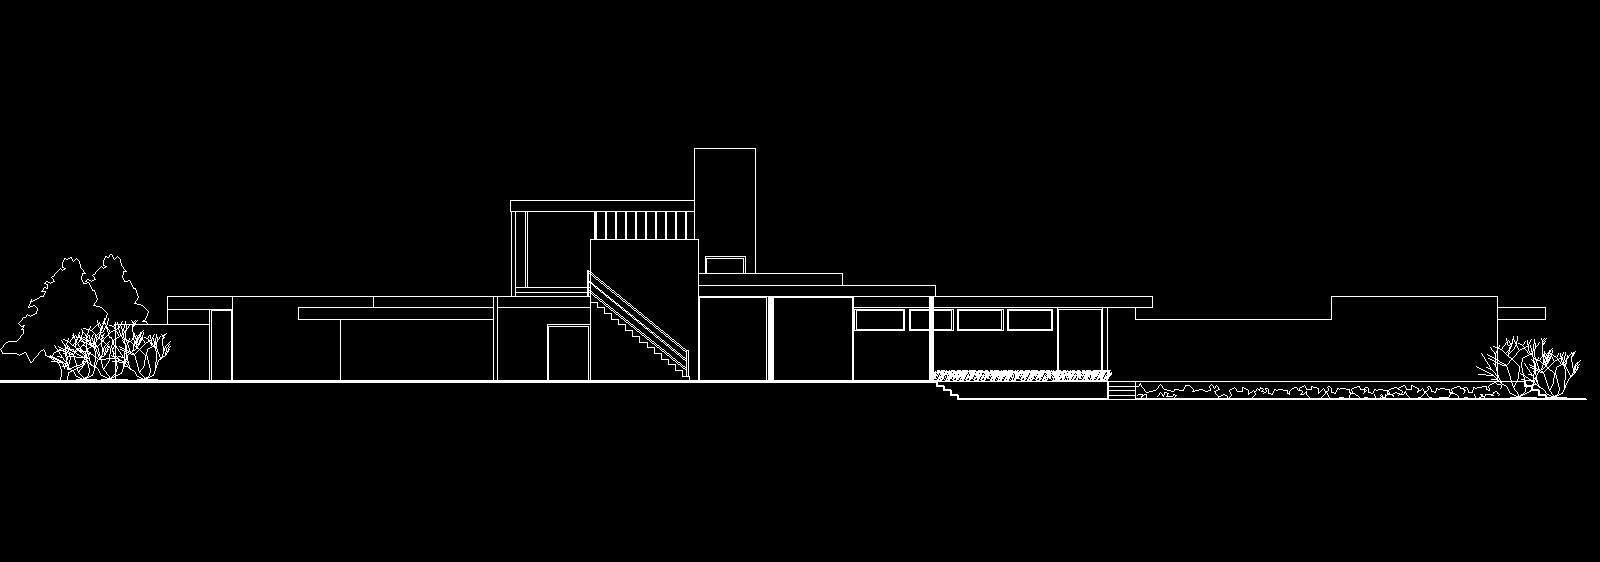 kaufmann desert house: elev